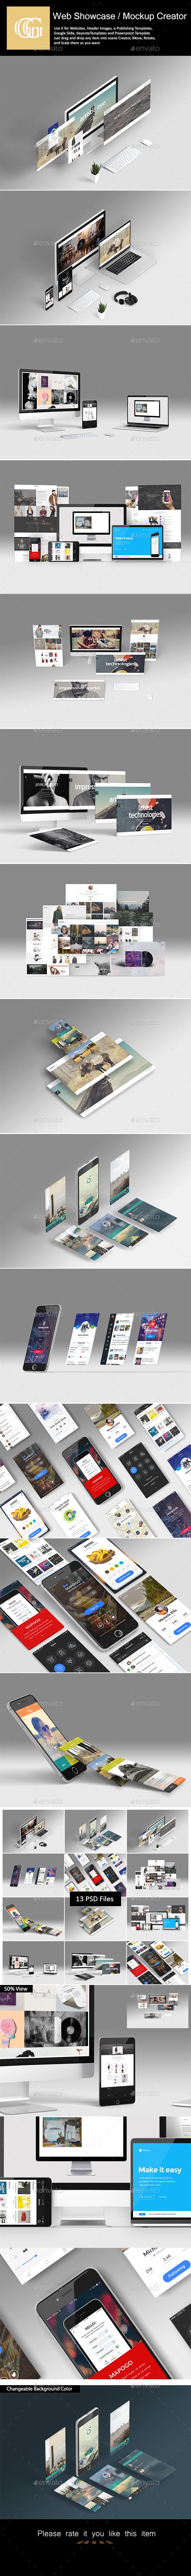 Web Showcase / Mockup Creator - Miscellaneous Print